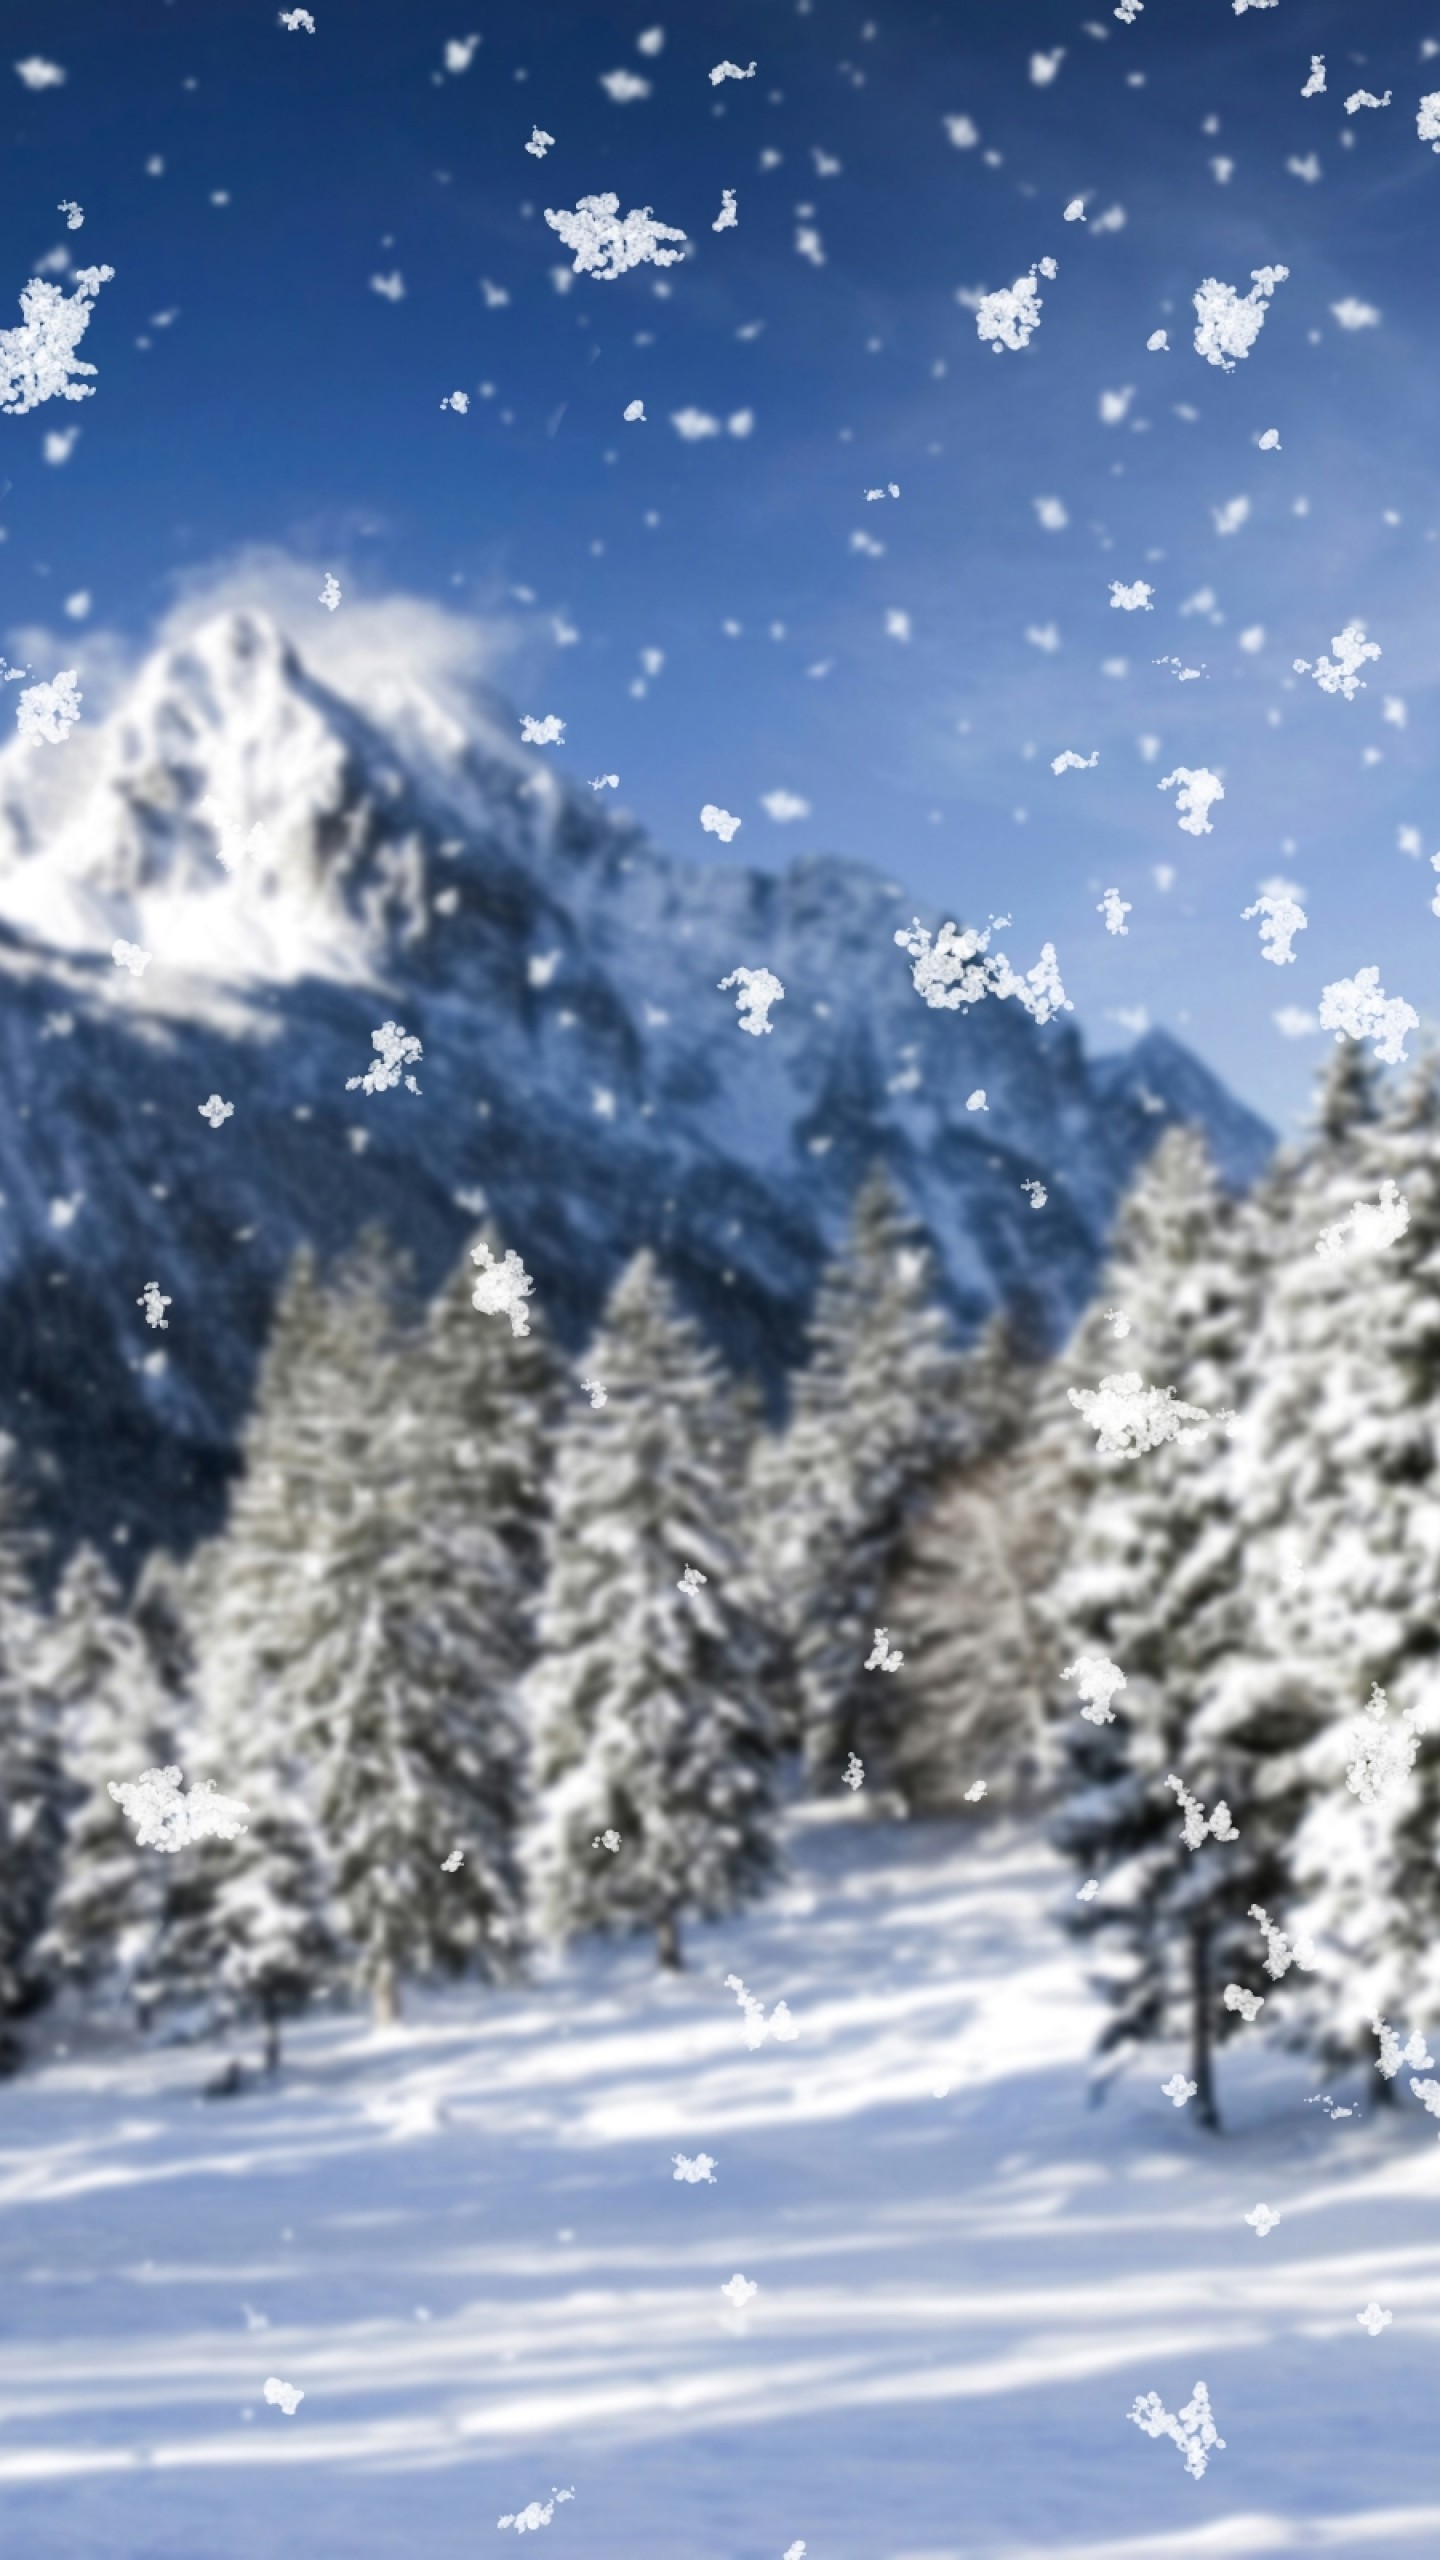 Windows 10 Wallpapers Hd Fall Snowfall Wallpaper 63 Images